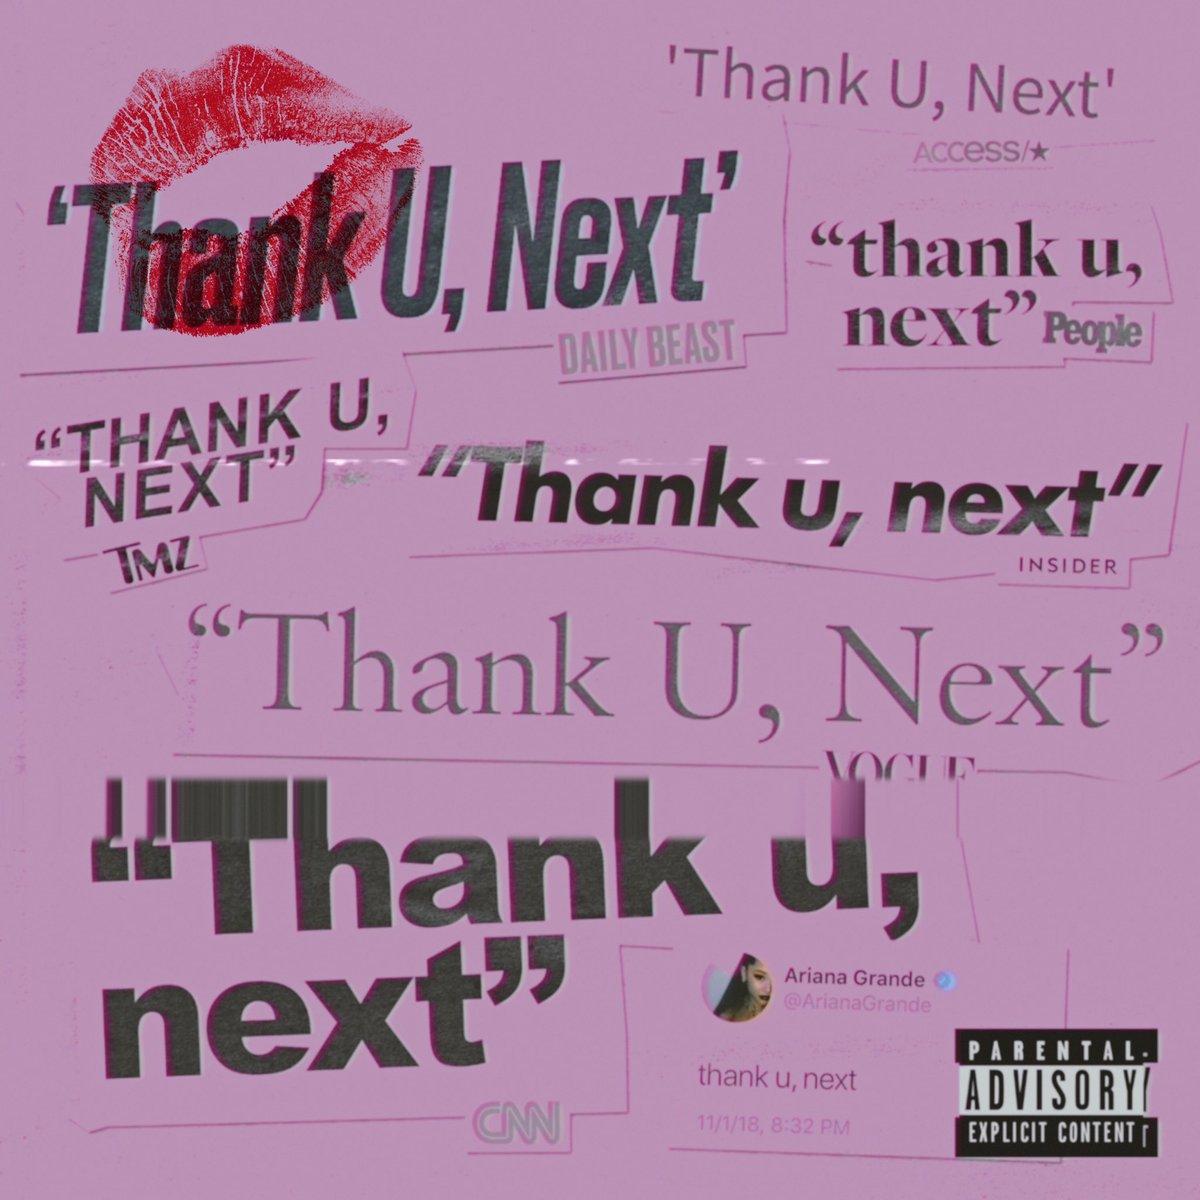 .@ArianaGrande drops her new single 'Thank You, Next.' Listen: https://t.co/kGL8Avqu54 �� https://t.co/90oIRaDDe1